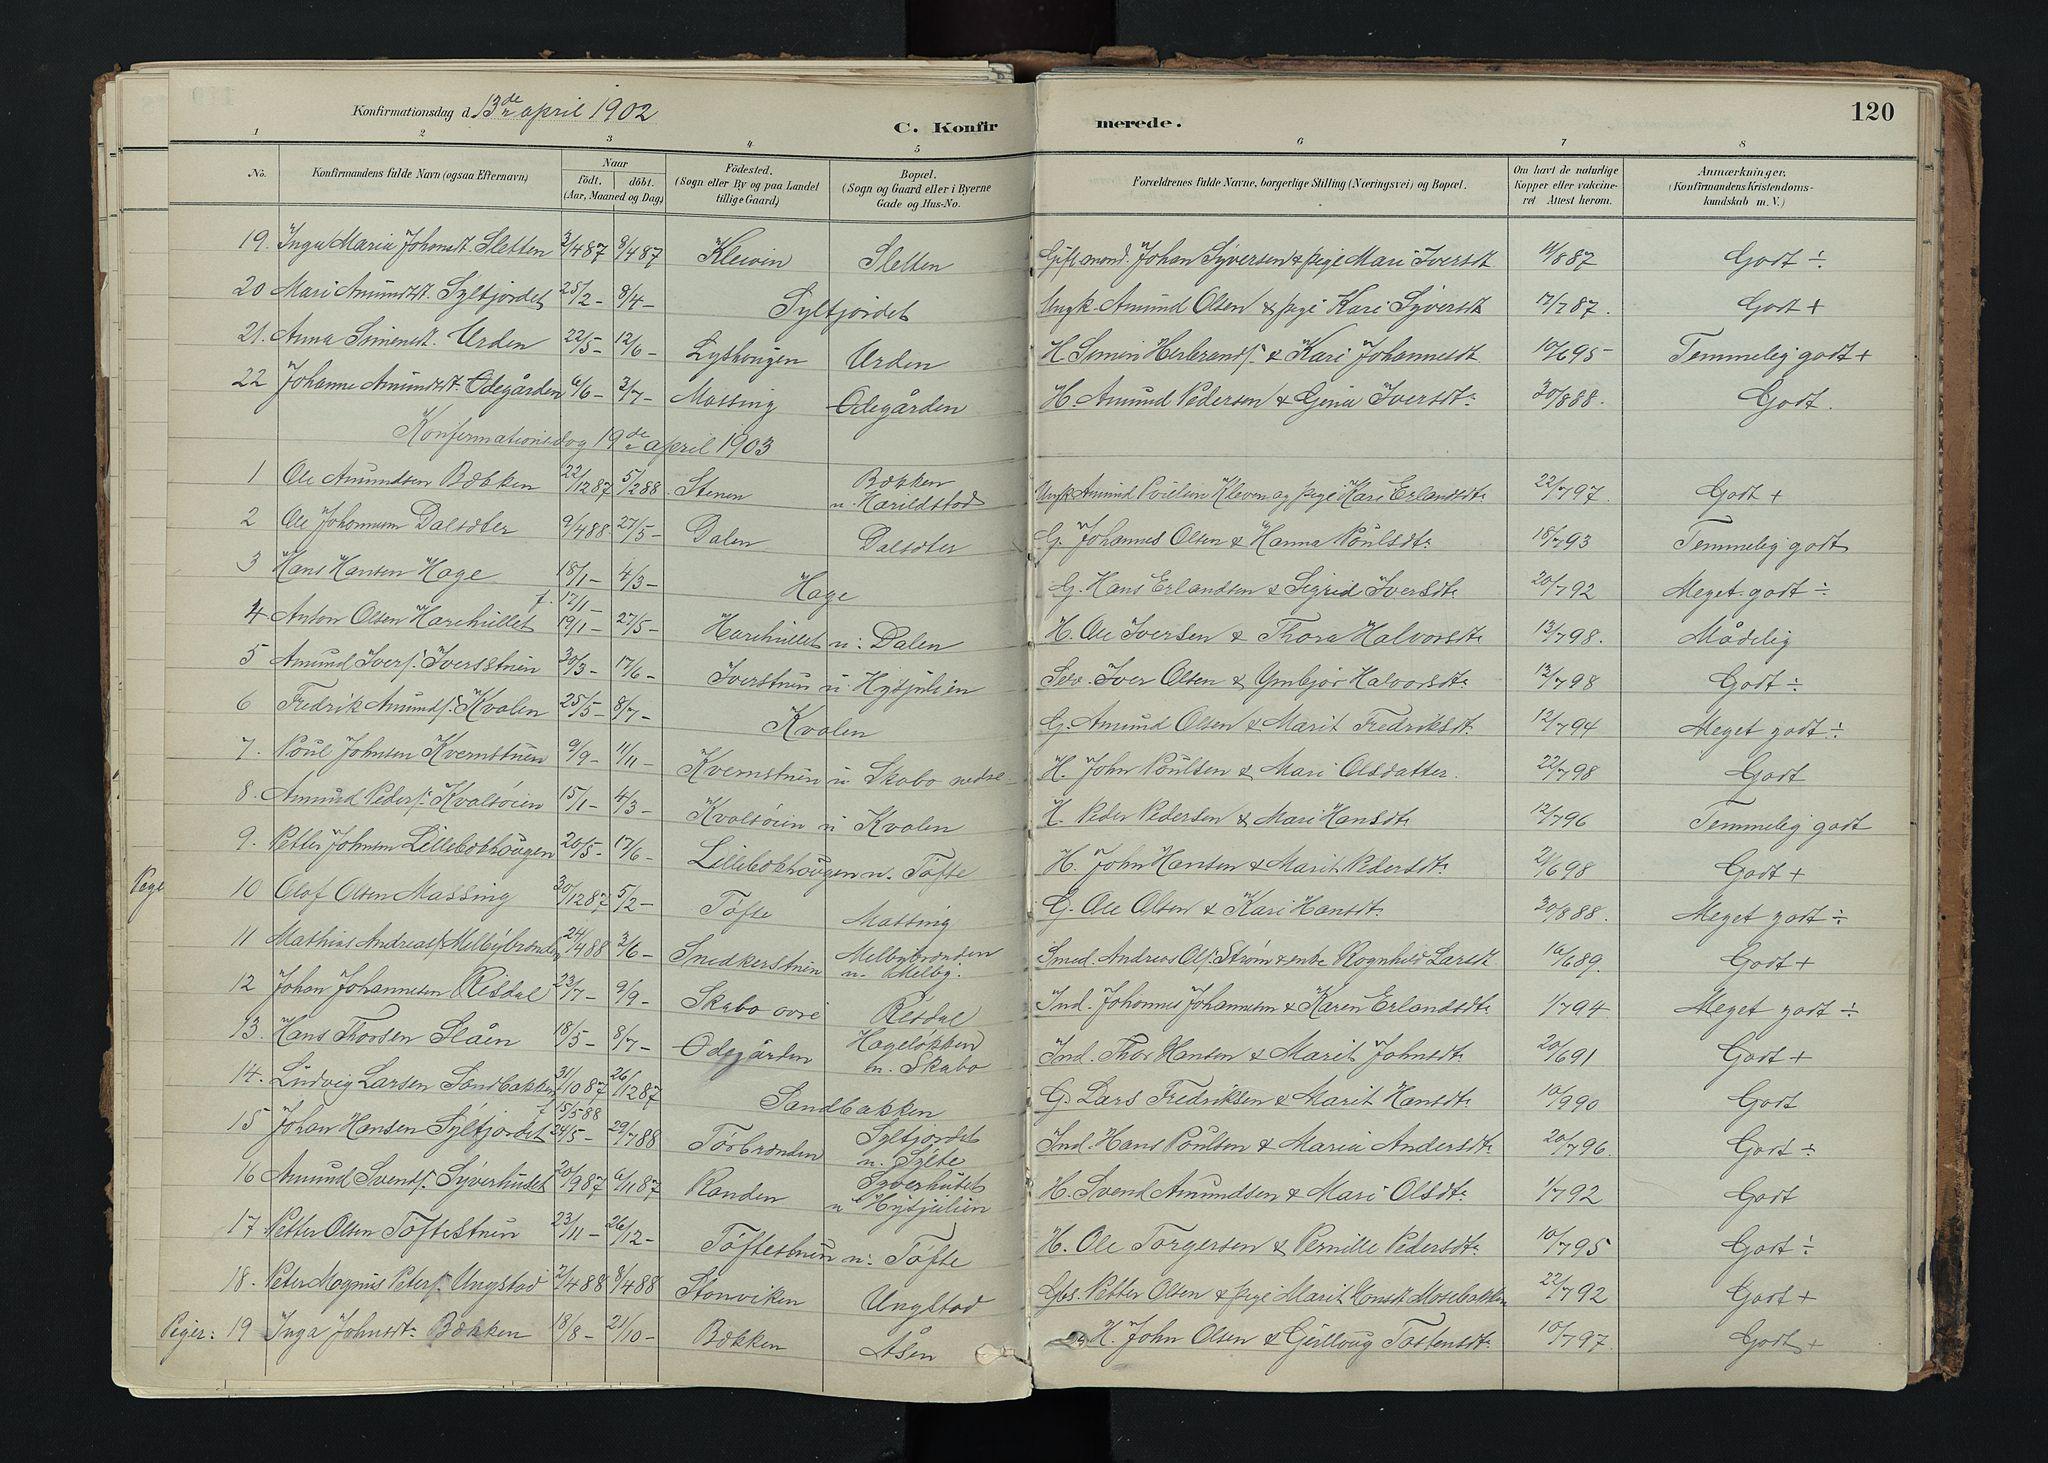 SAH, Nord-Fron prestekontor, Ministerialbok nr. 5, 1884-1914, s. 120